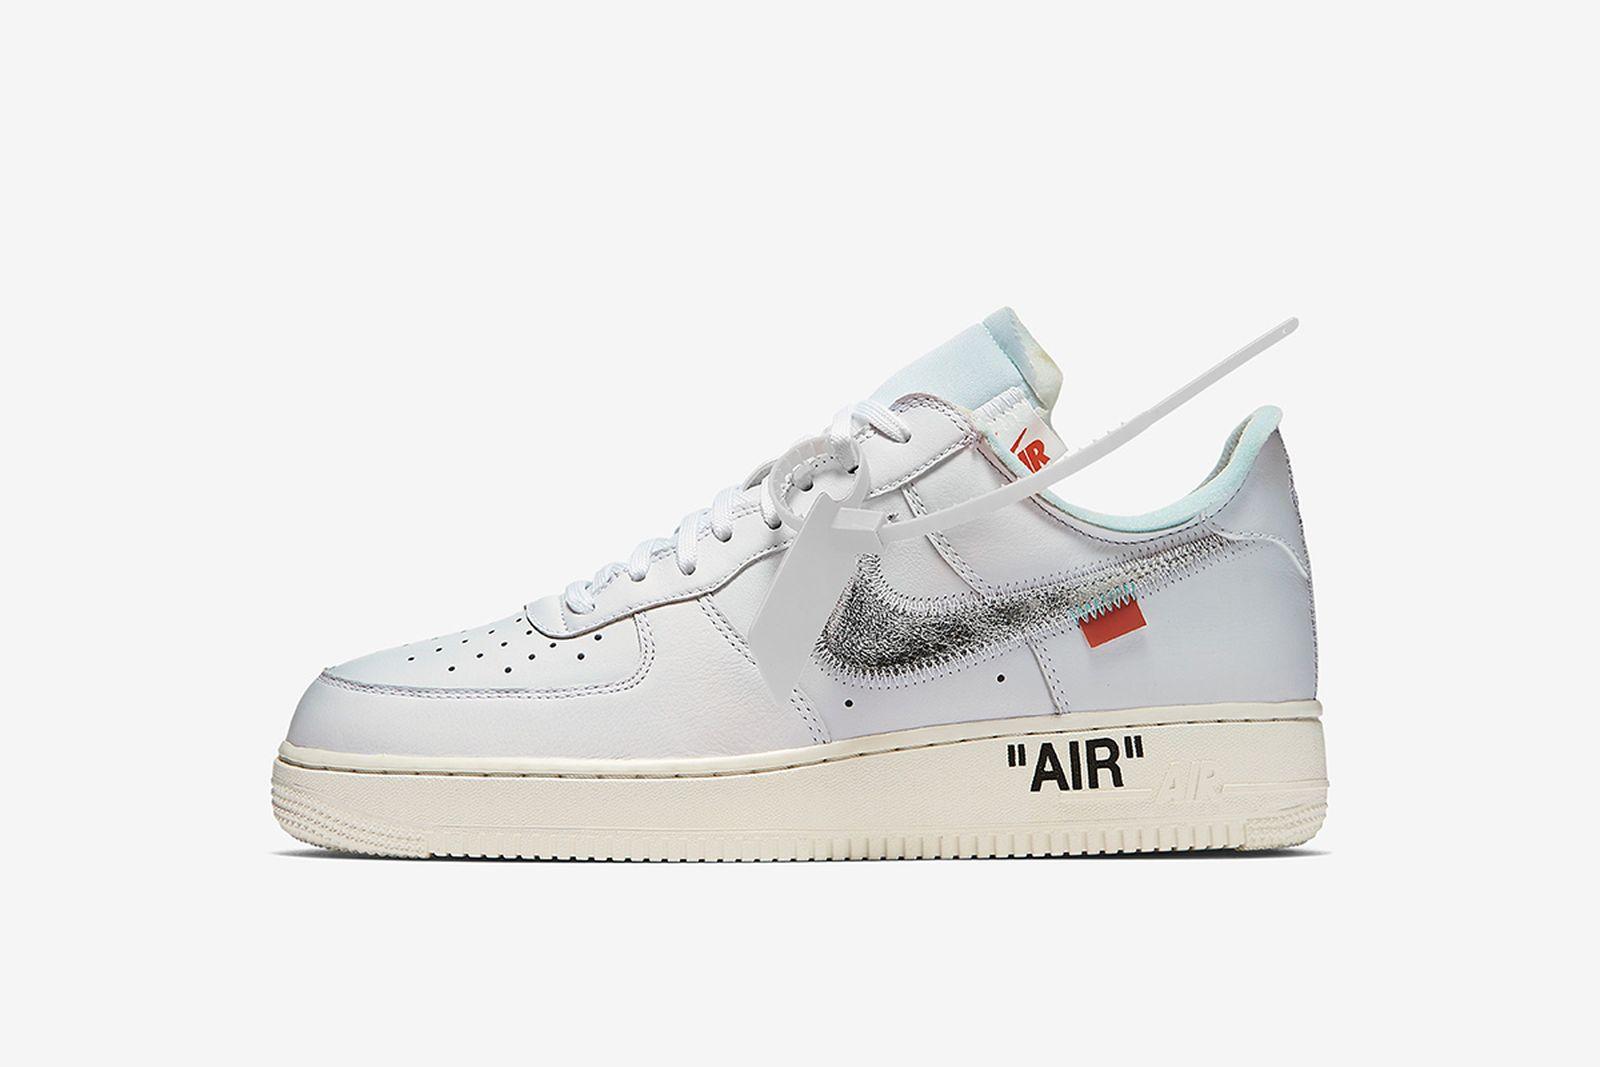 air force 1 white GOAT Nike The Ten OFF-WHITE c/o Virgil Abloh